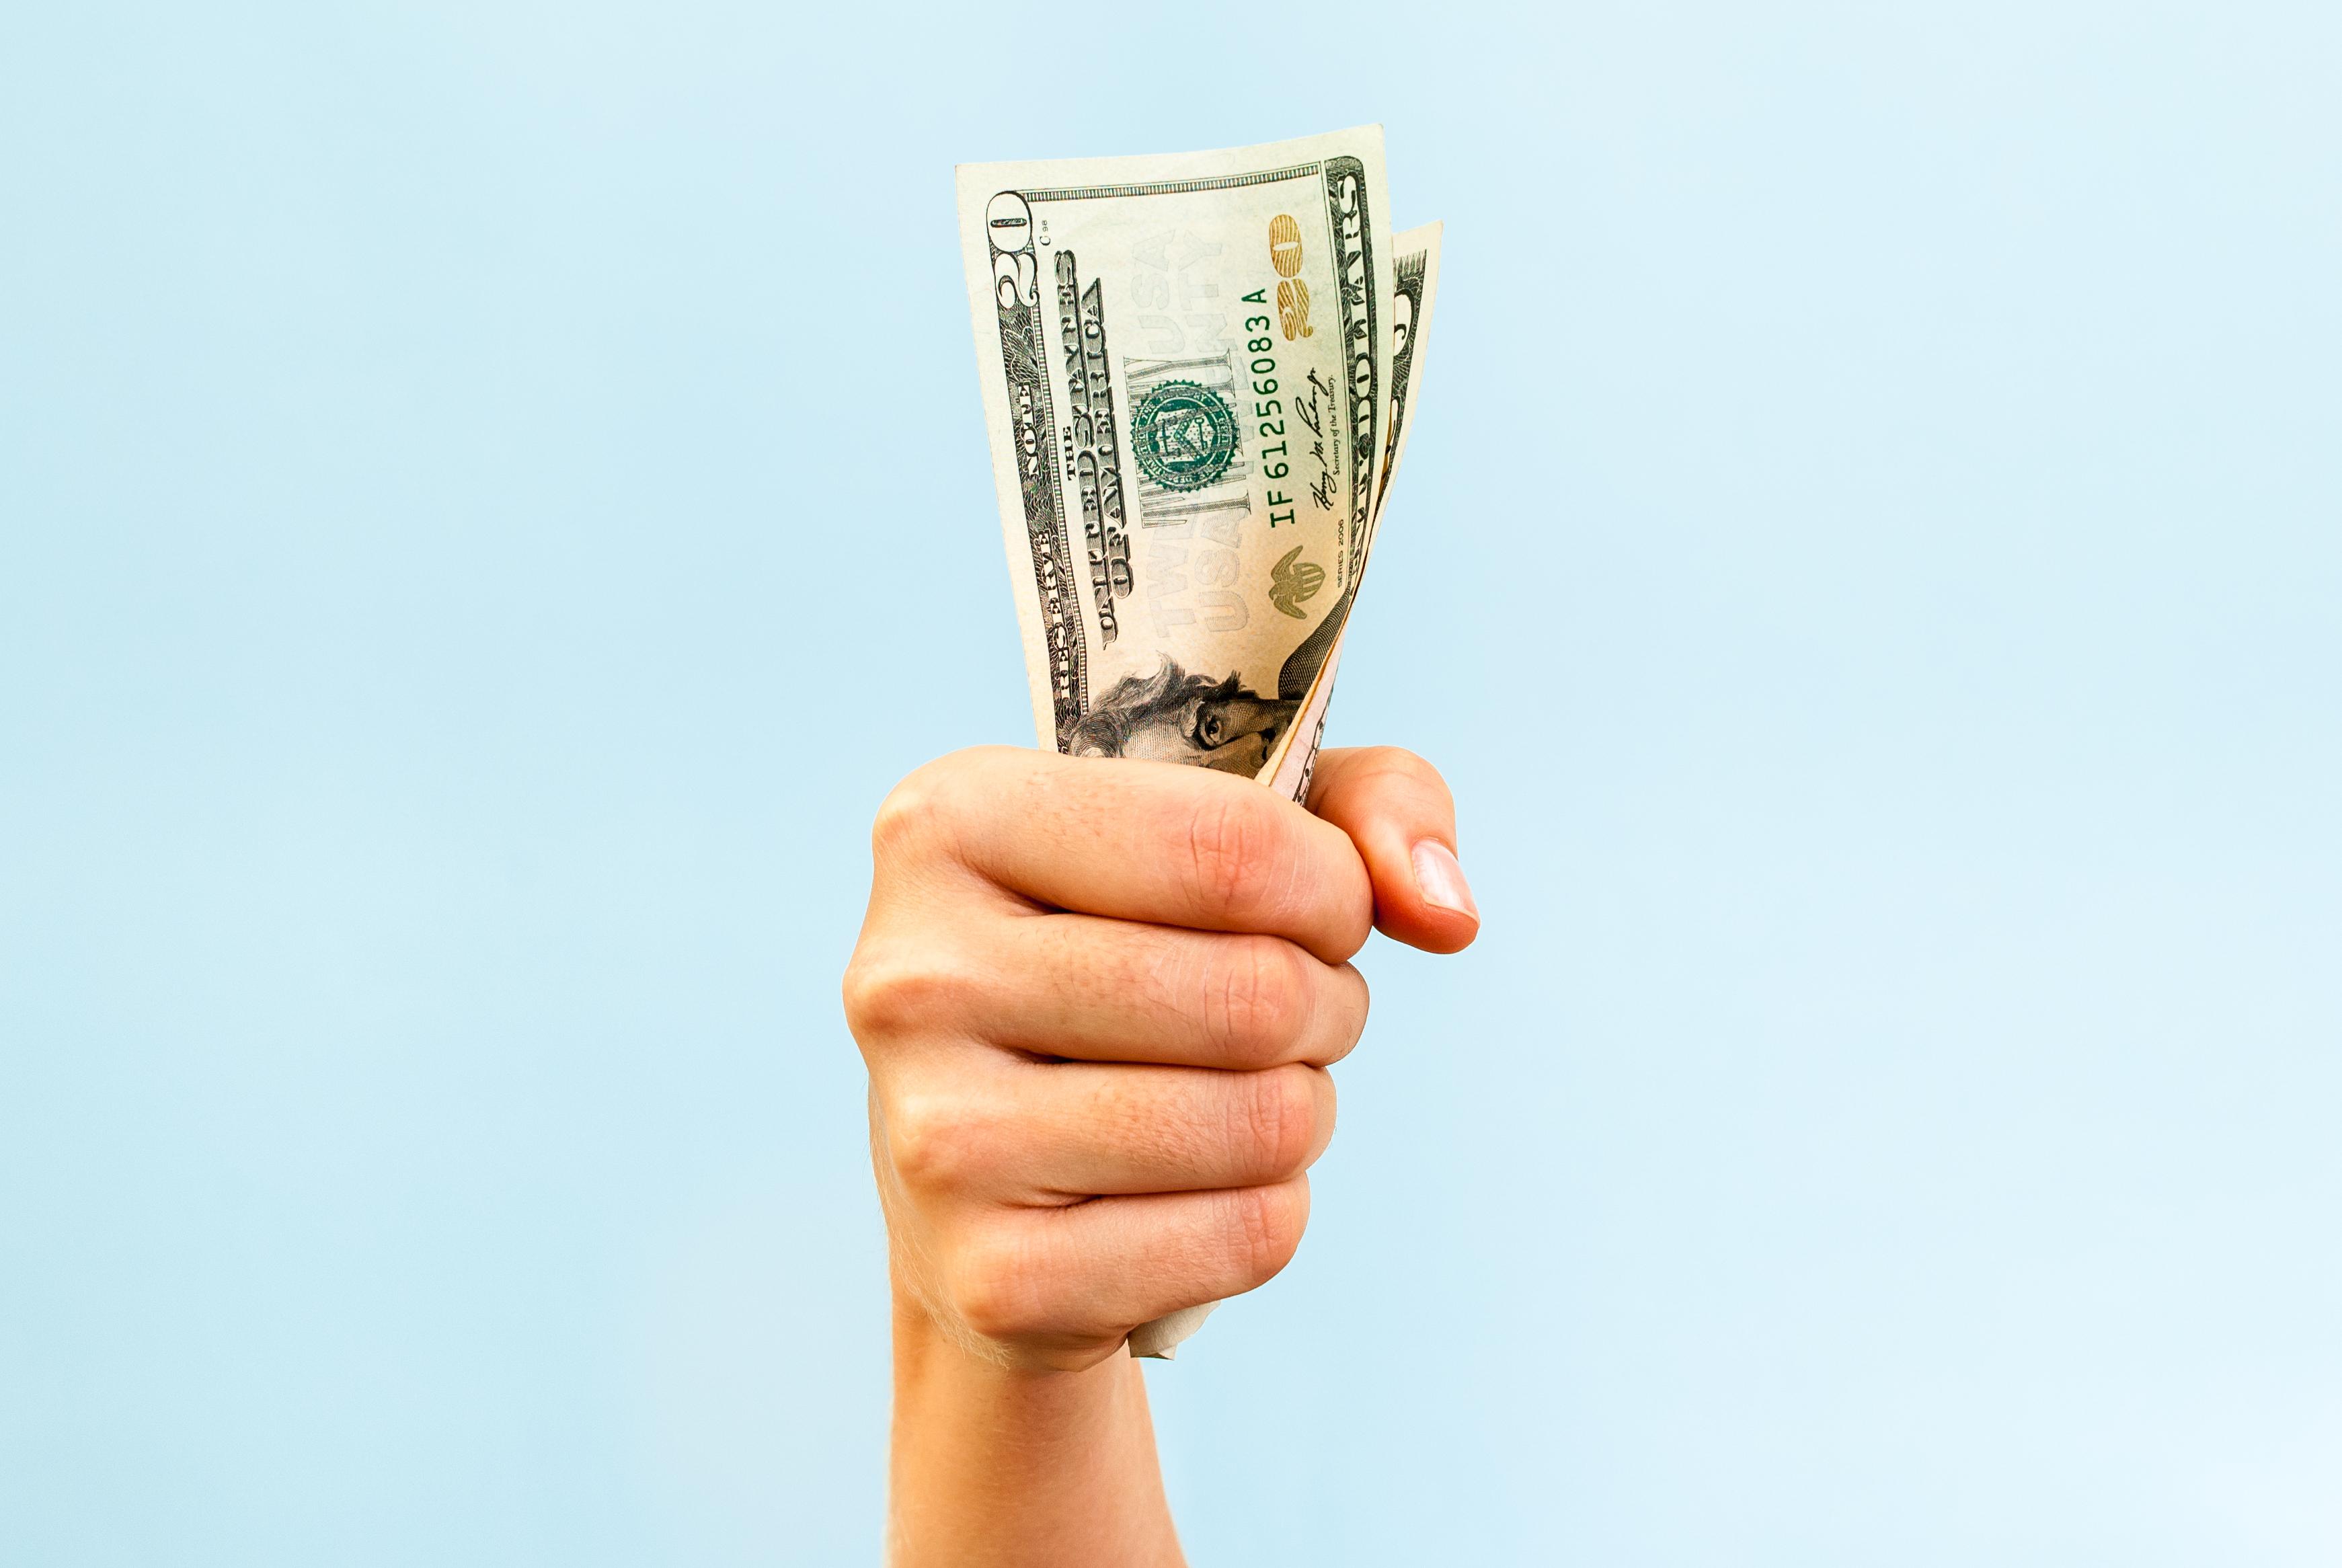 YOU DON'T HAVE A MONEY PROBLEM, YOU HAVE AN IDEA/ RELATIONAL PROBLEM